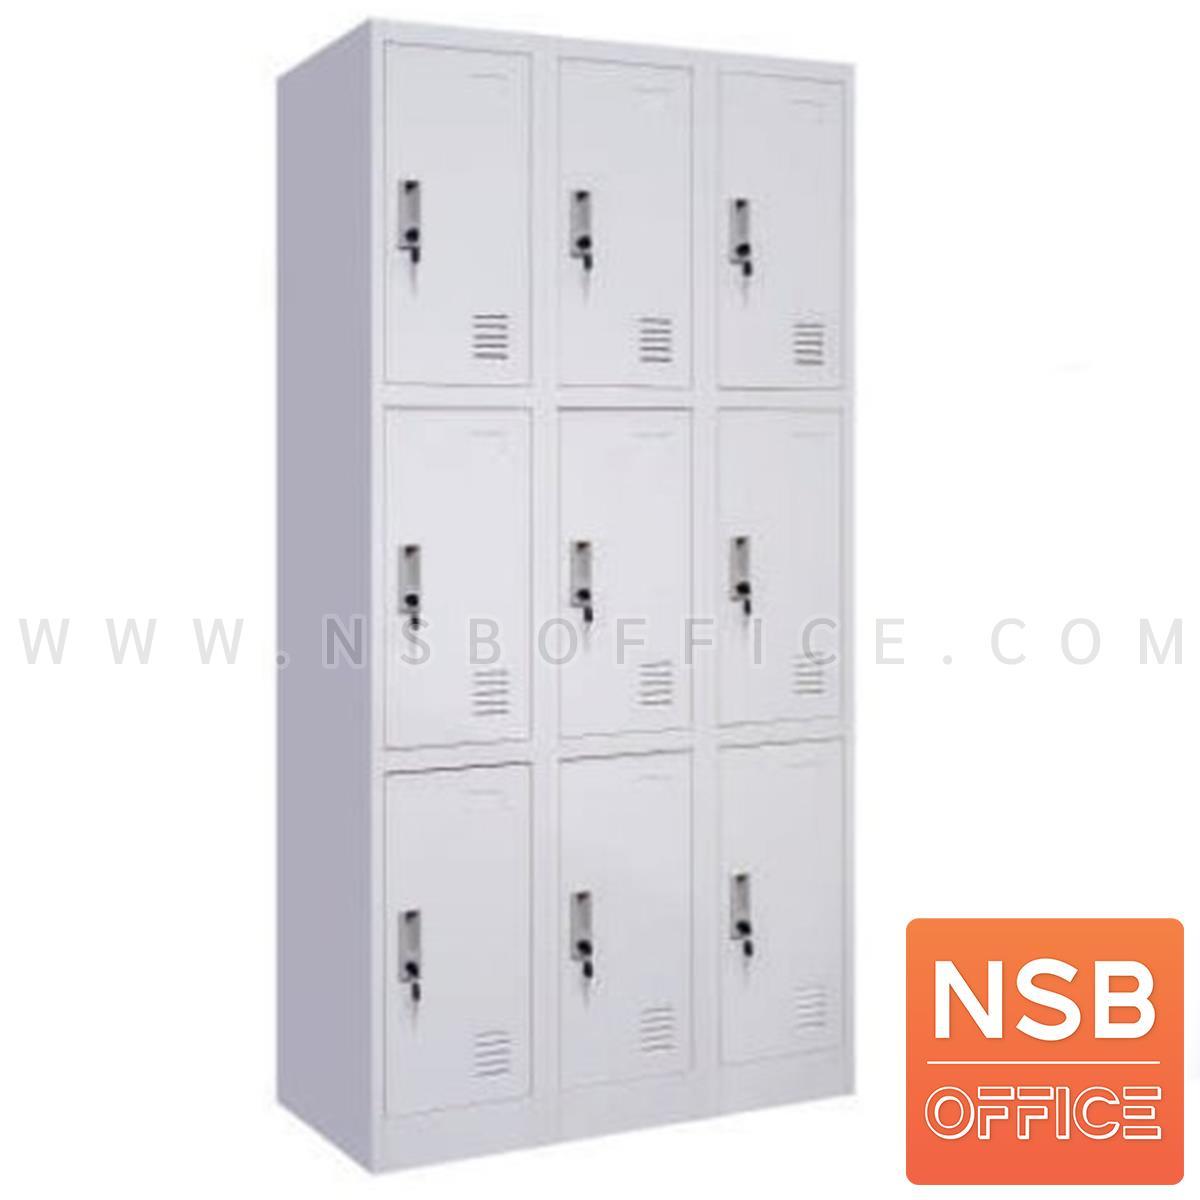 E03A058:ตู้ล็อกเกอร์ 9 ประตู รุ่น Ironhide (ไอออนไฮด์) ขนาด 91.7W*45.7D*185H ซม